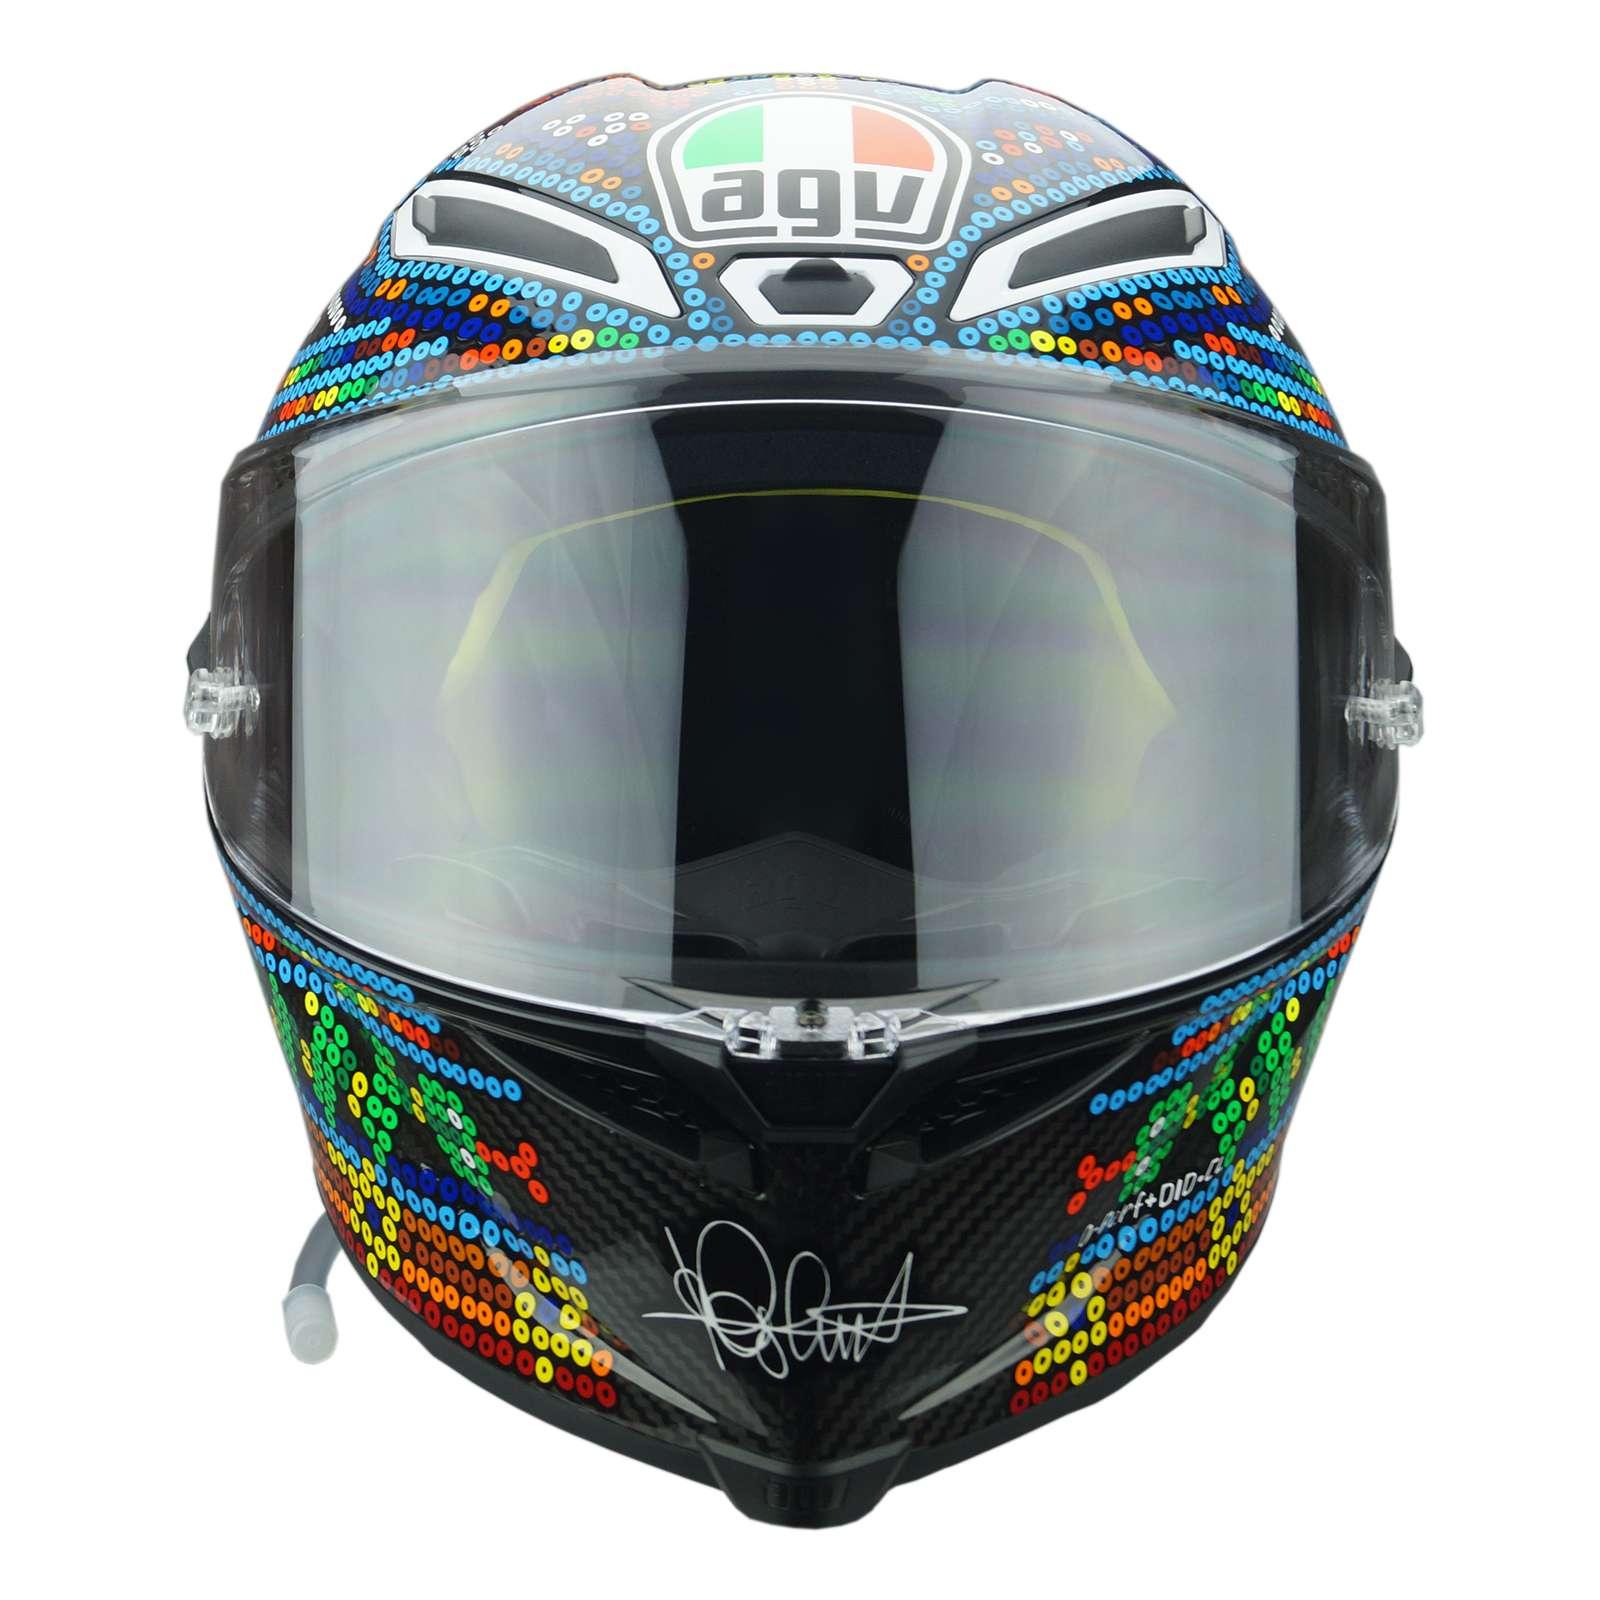 f8984403dda33 AGV Pista GP-R Limited Edition Rossi Winter Test 2018 Carbon Motorcycle  Helmet